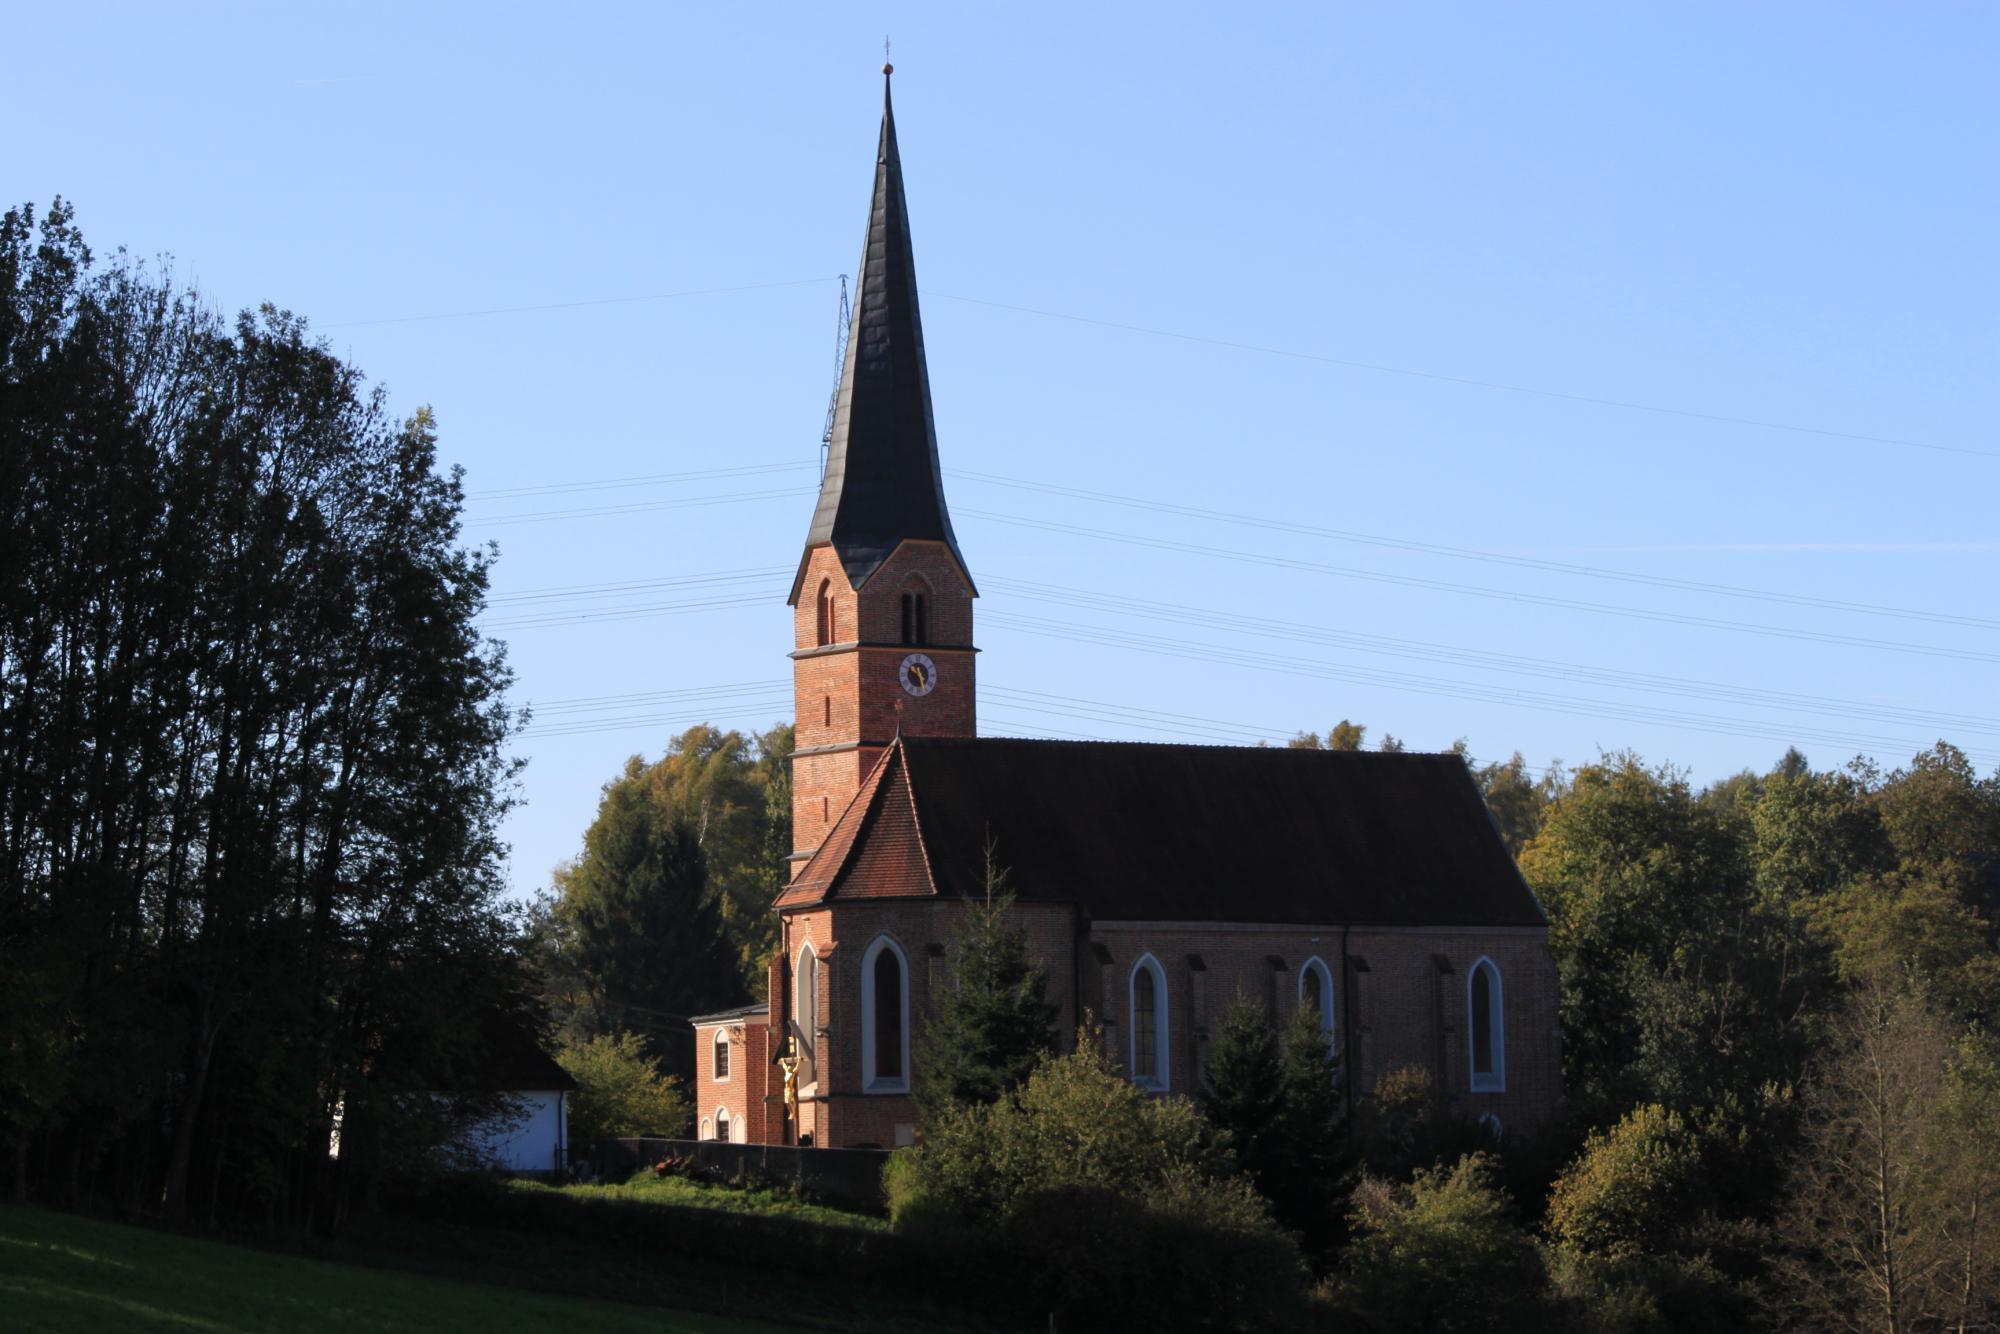 Pfarrkirche-St.-Stephanus_Reut